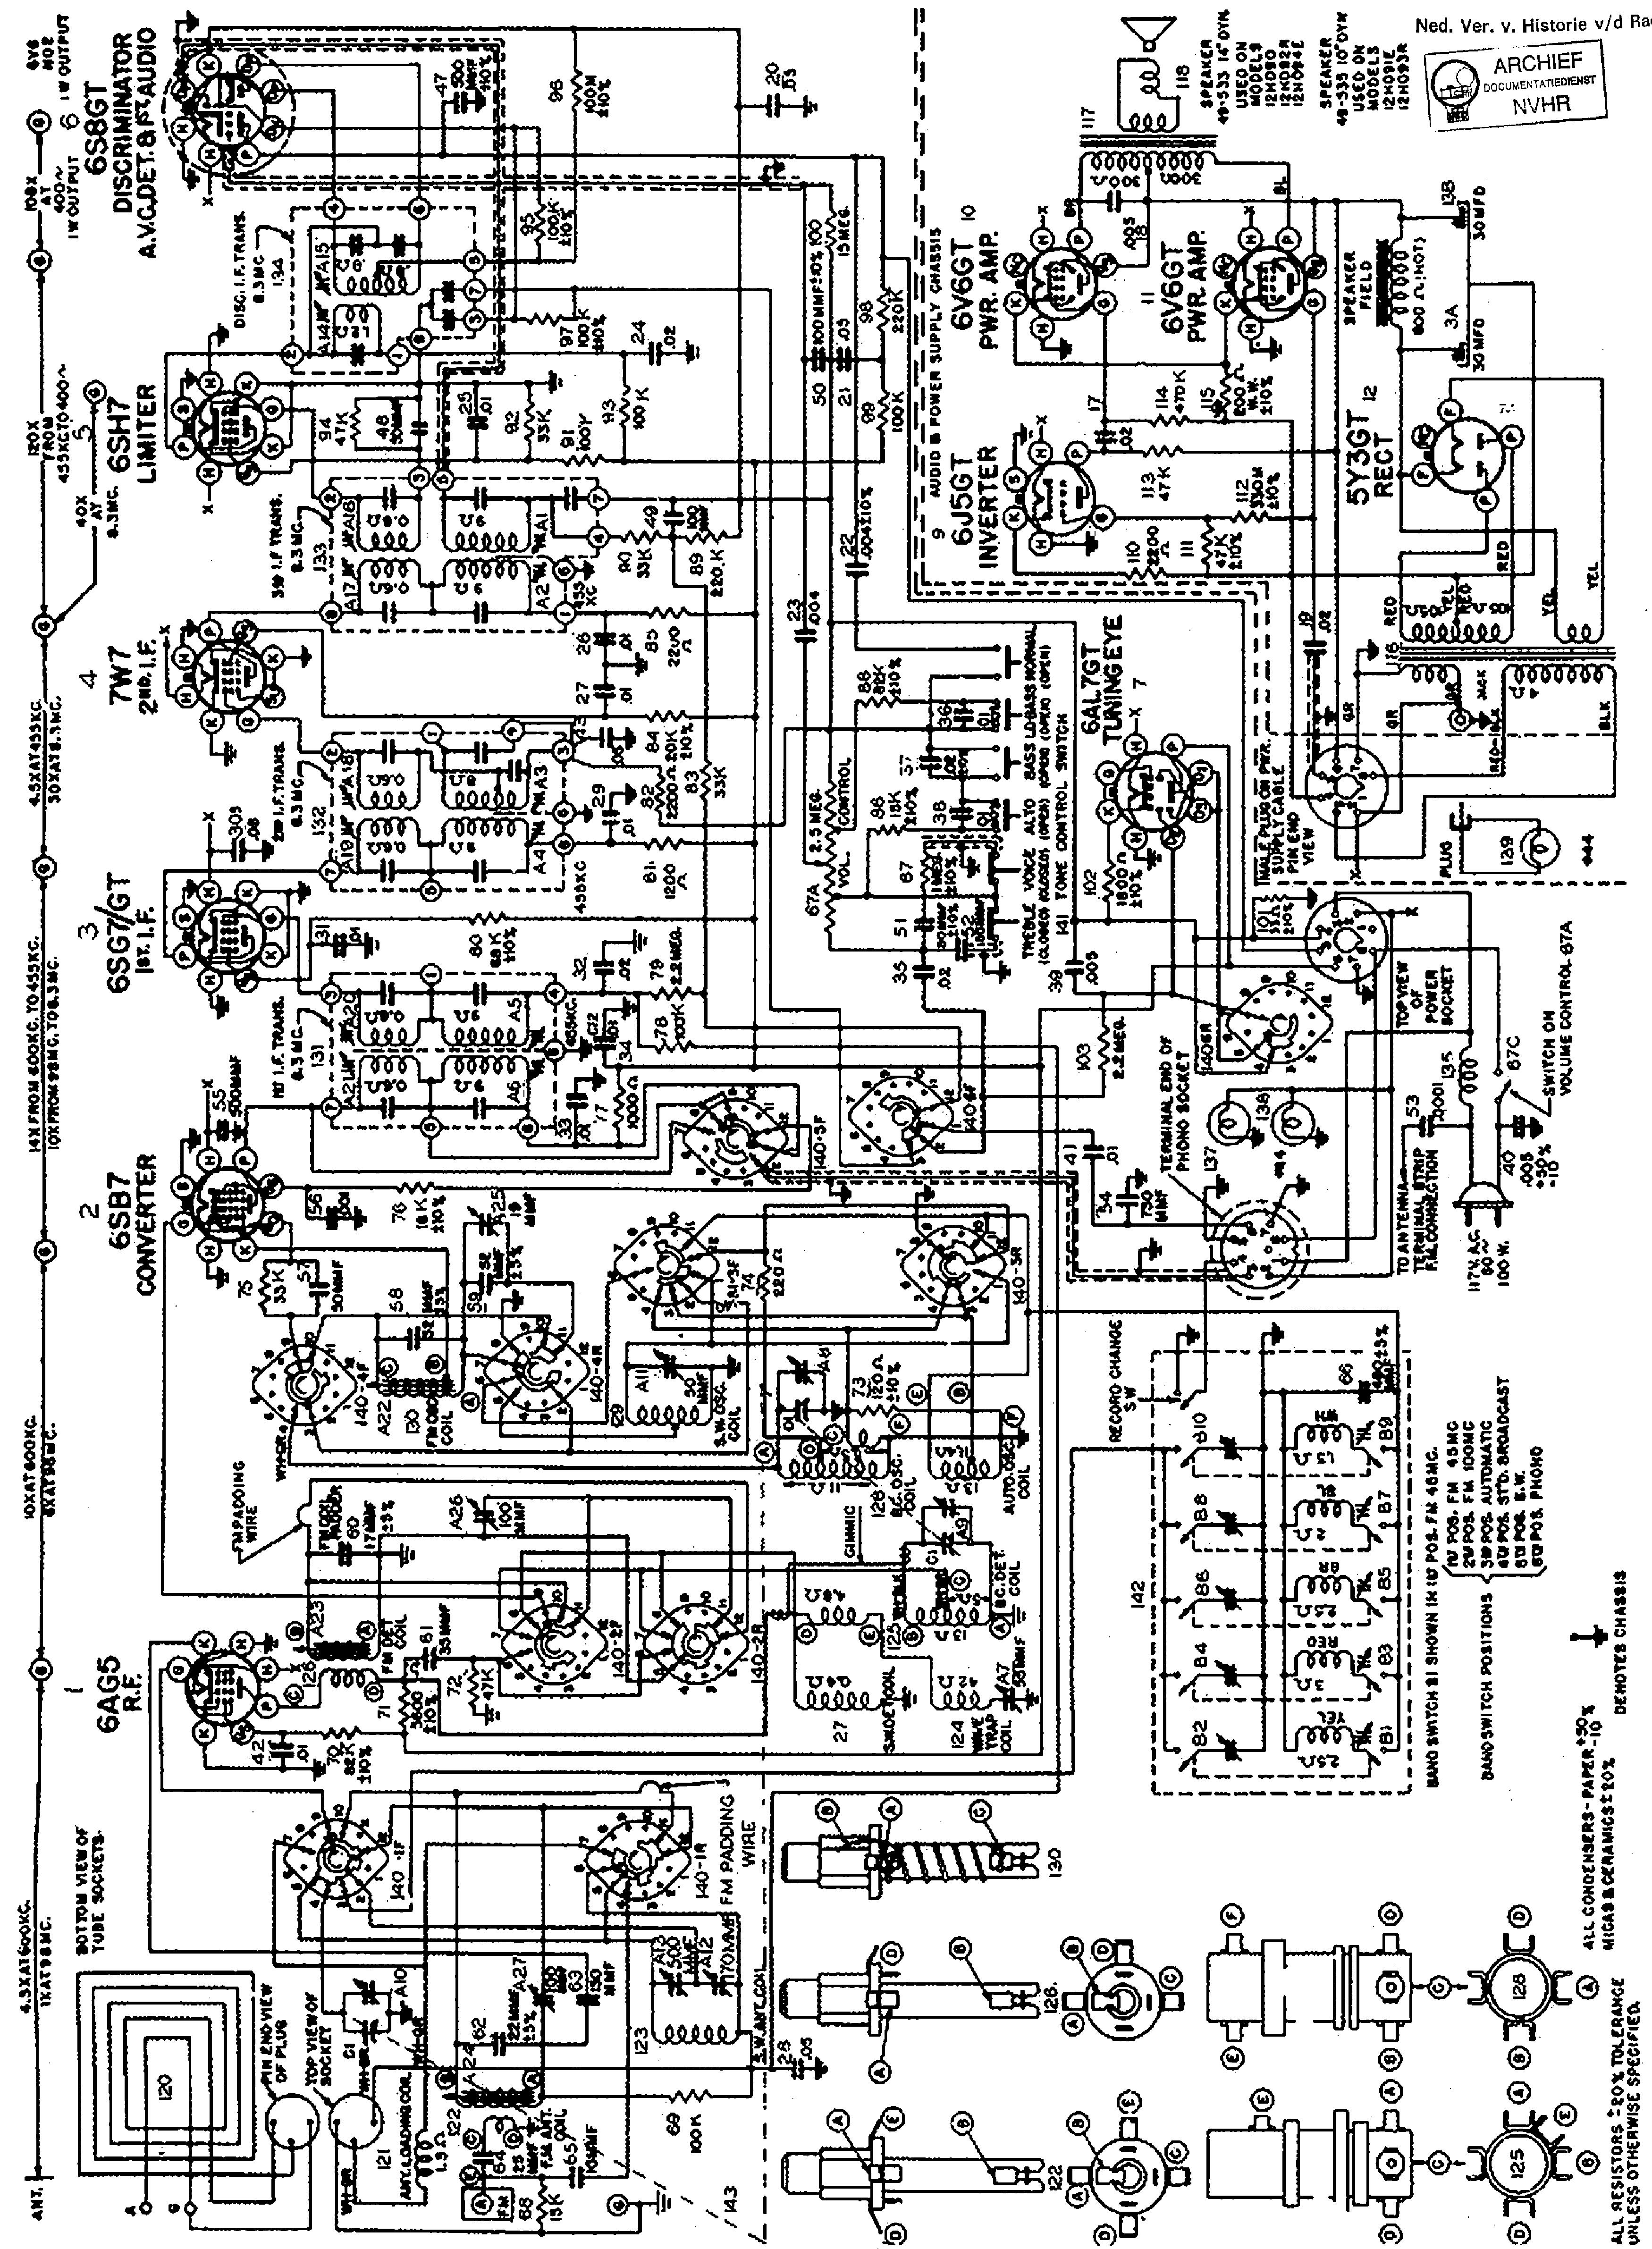 zenith 12h090 am-fm receiver sch service manual (1st page)